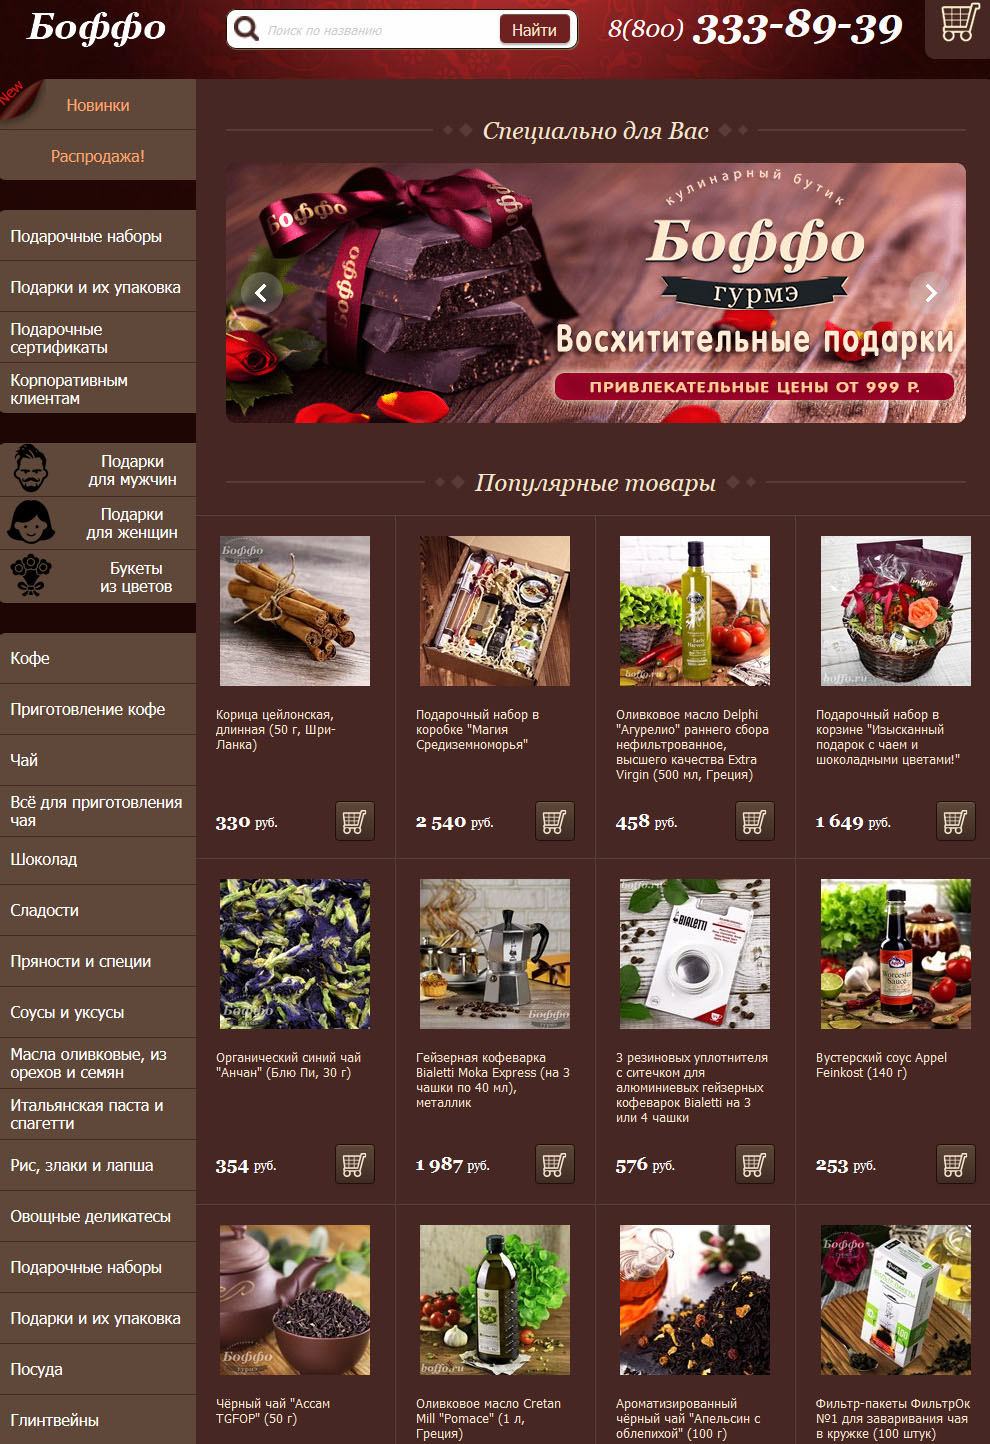 Интернет-магазин Боффо